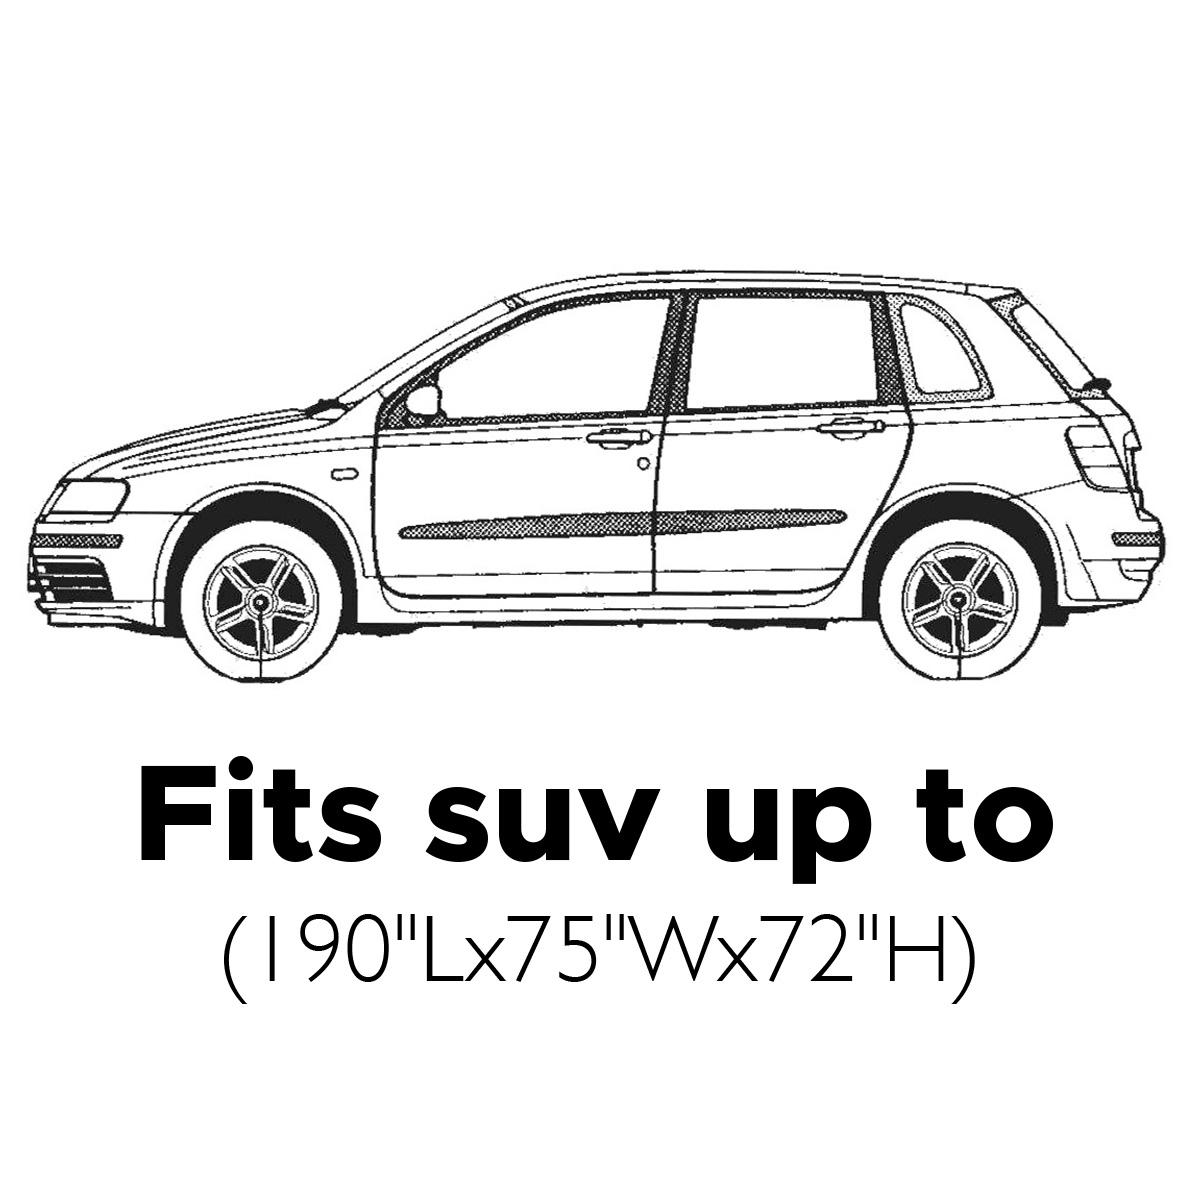 Matcc-SUV-car cover design